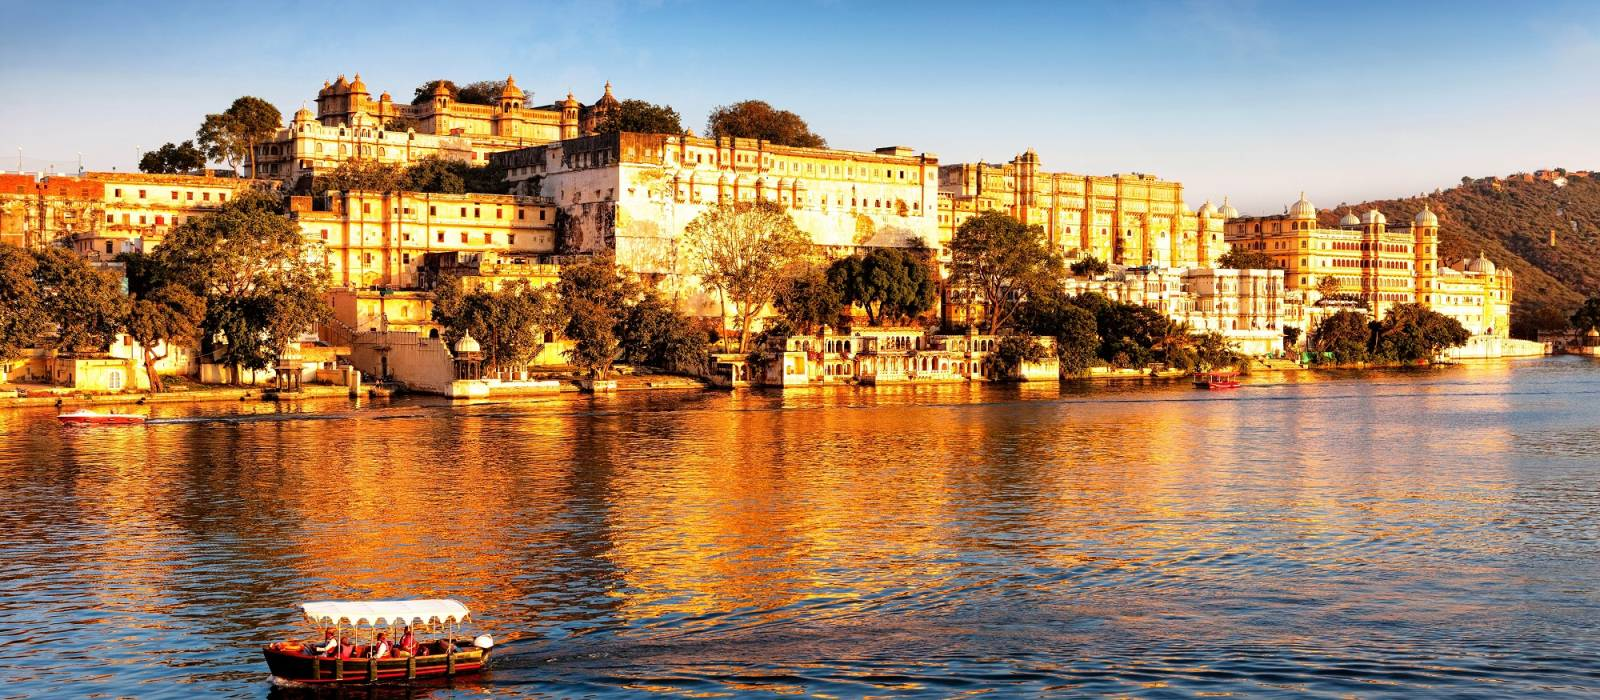 Sprituelles Nordindien – Goldener Tempel, Ganges und Varanasi Urlaub 1